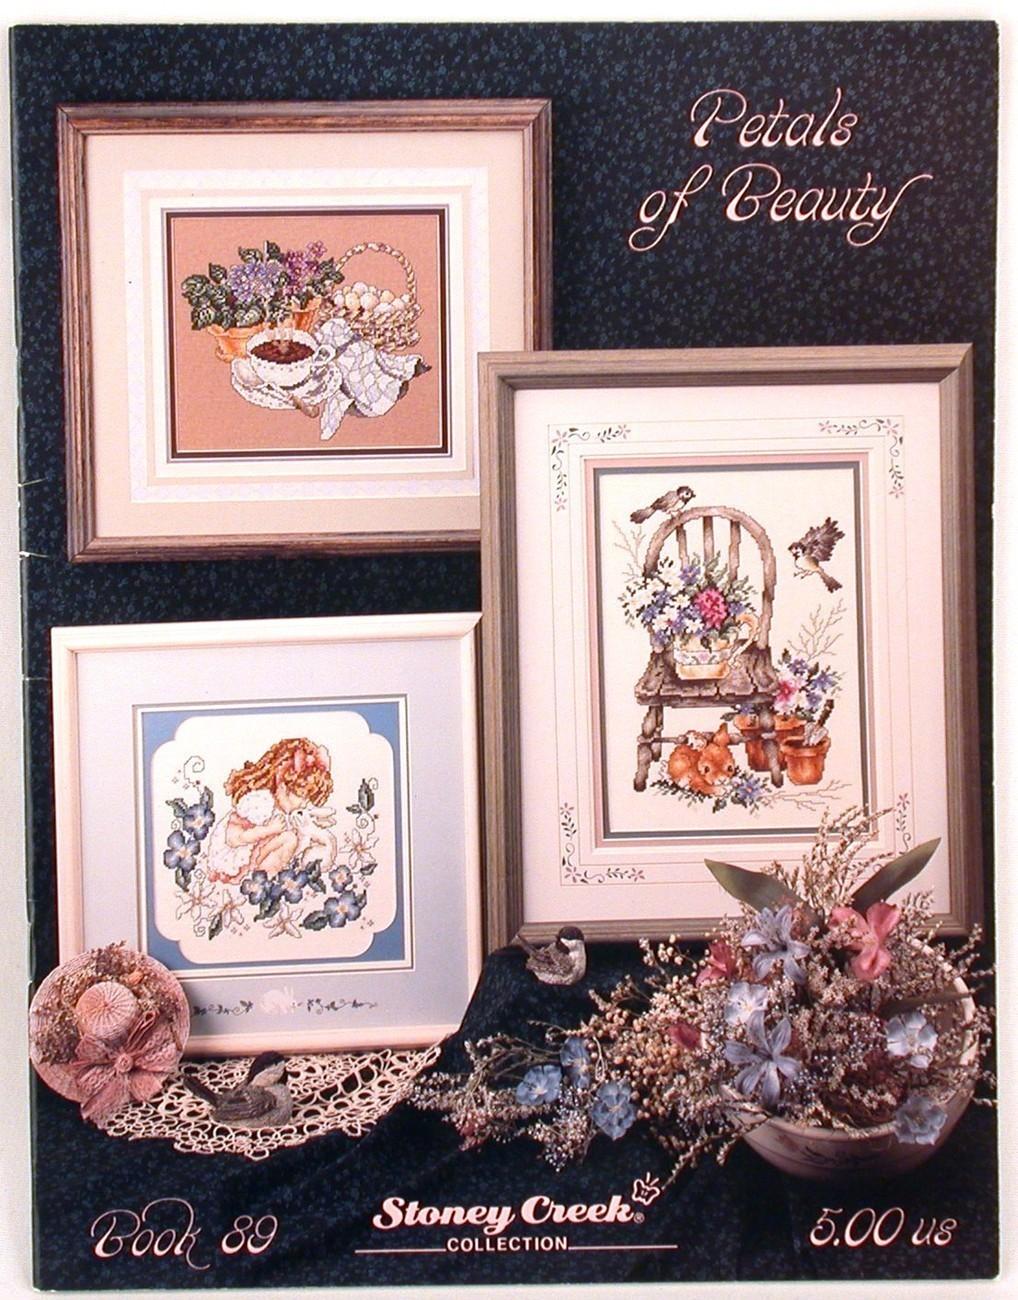 Cross stitch petals of beauty